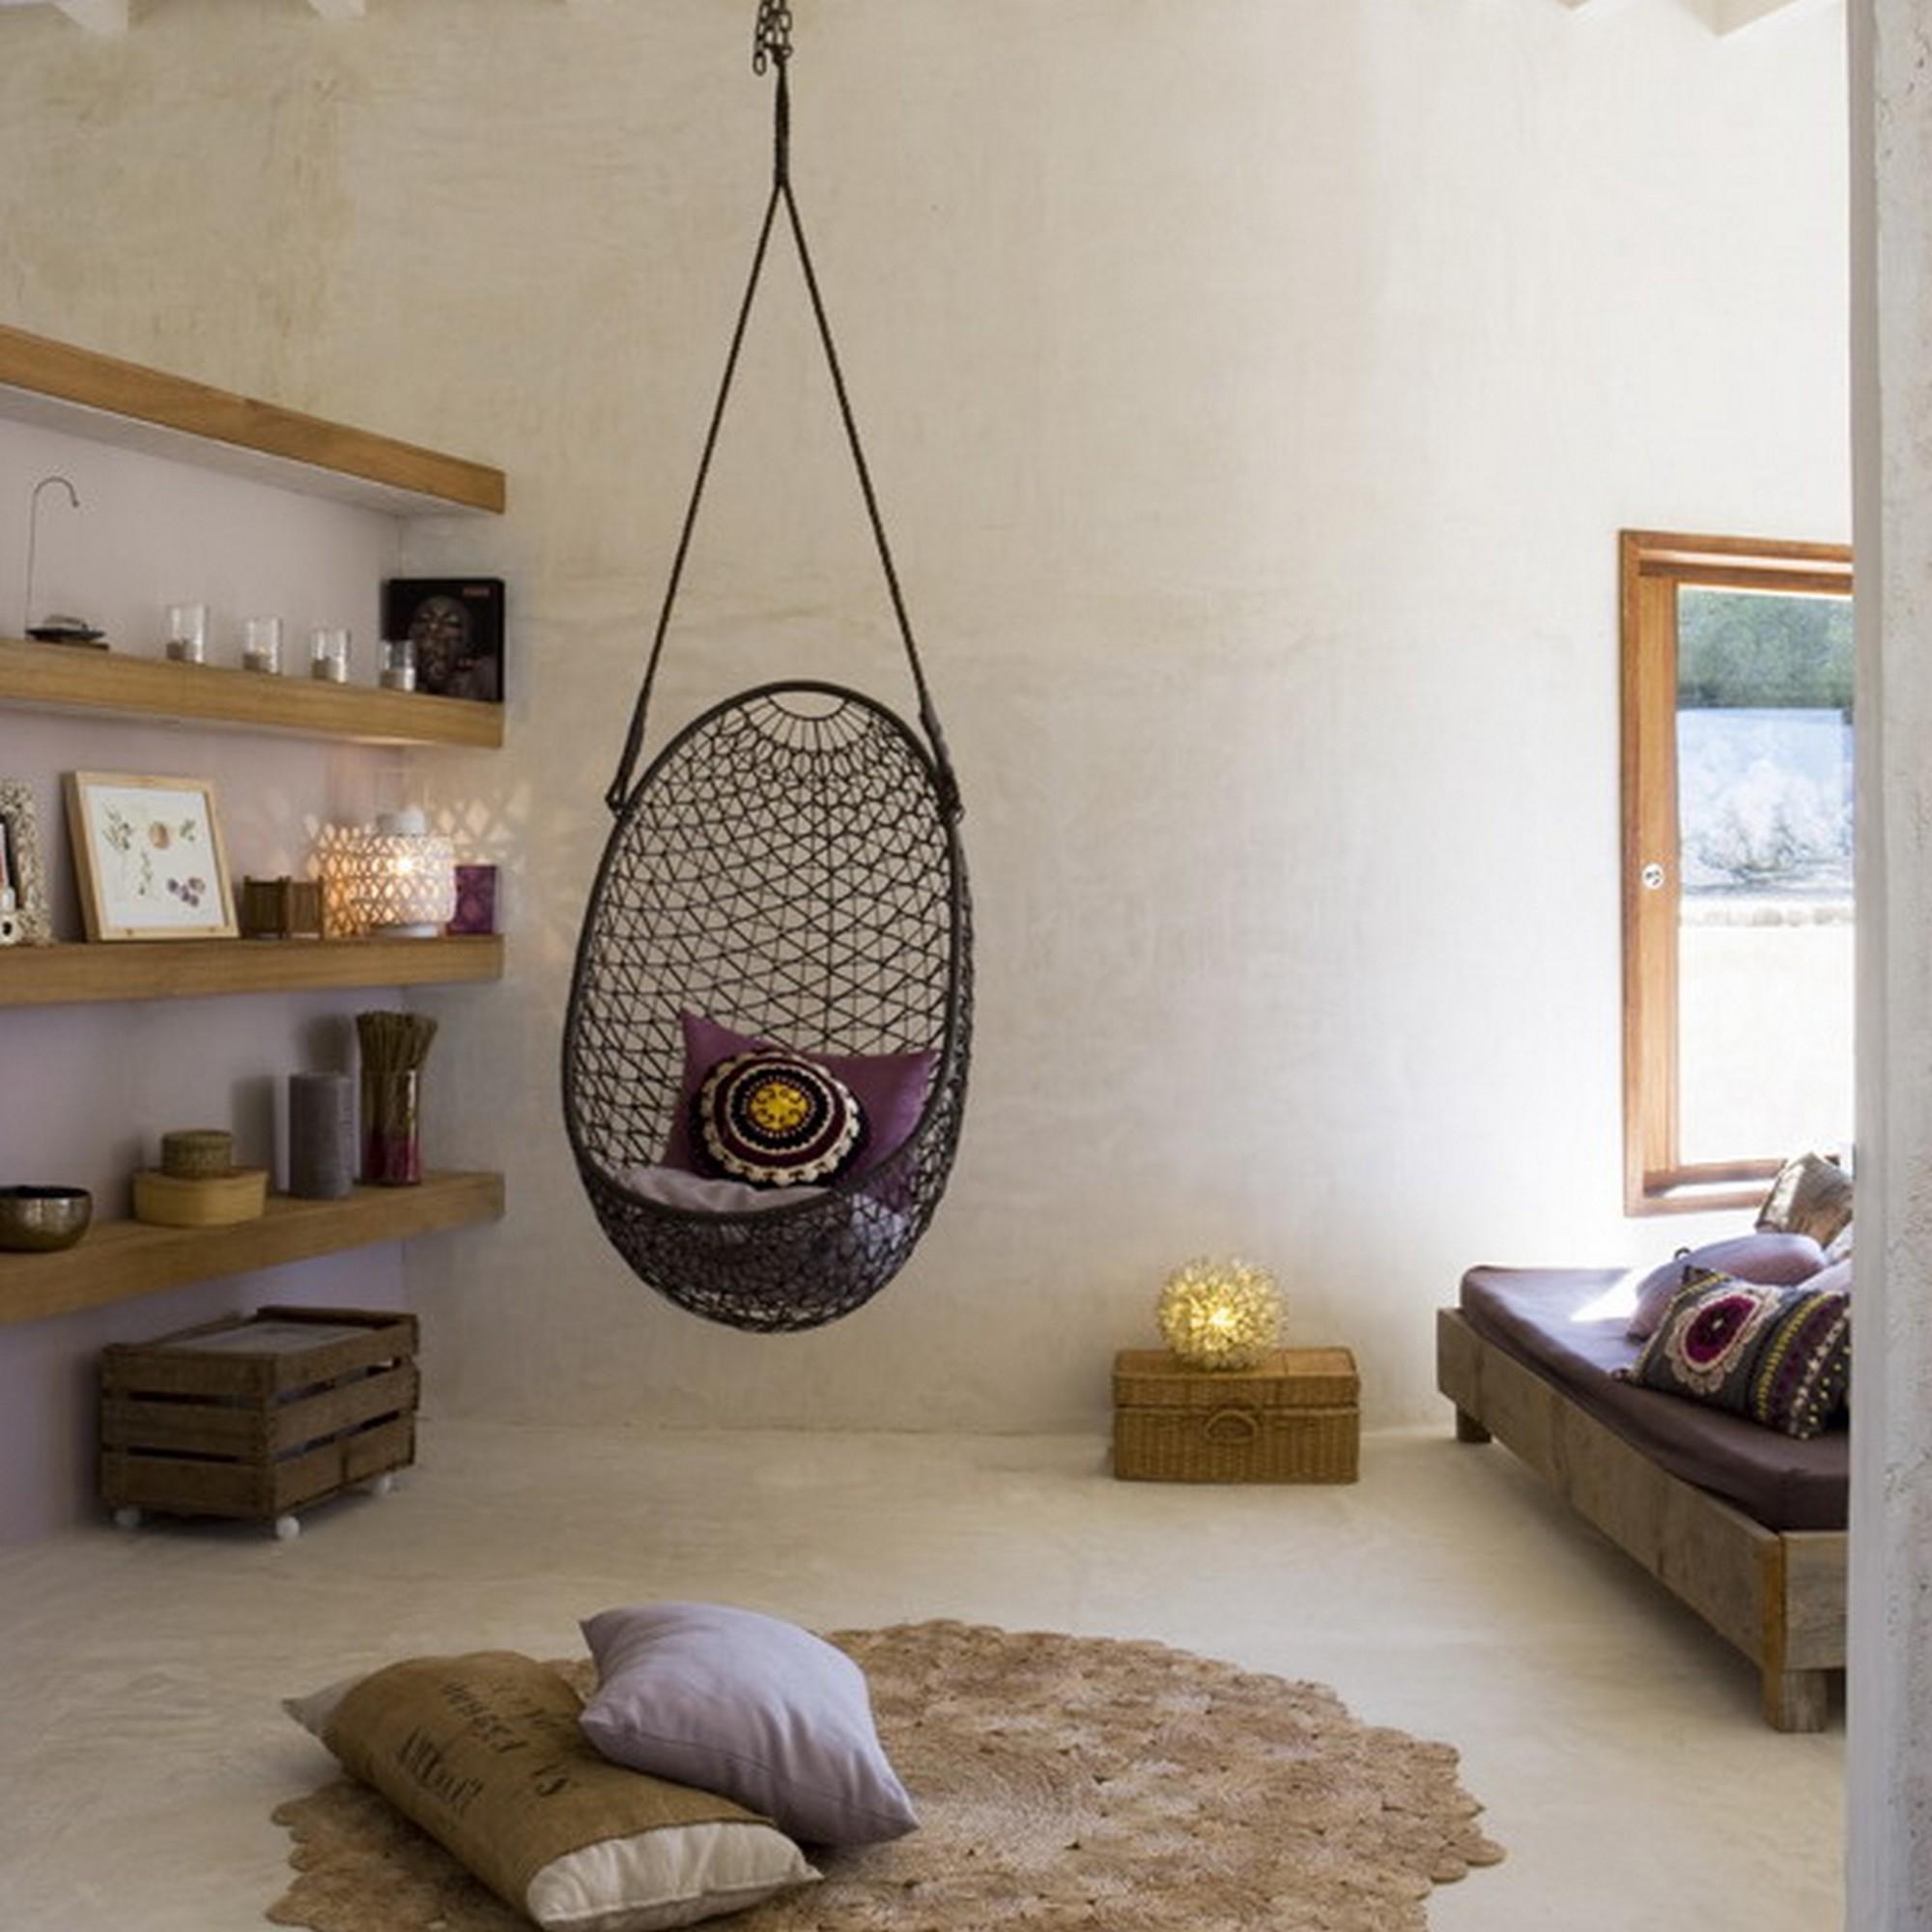 Hanging Chair For Bedrooms 17 20 Internist Dr Horn De